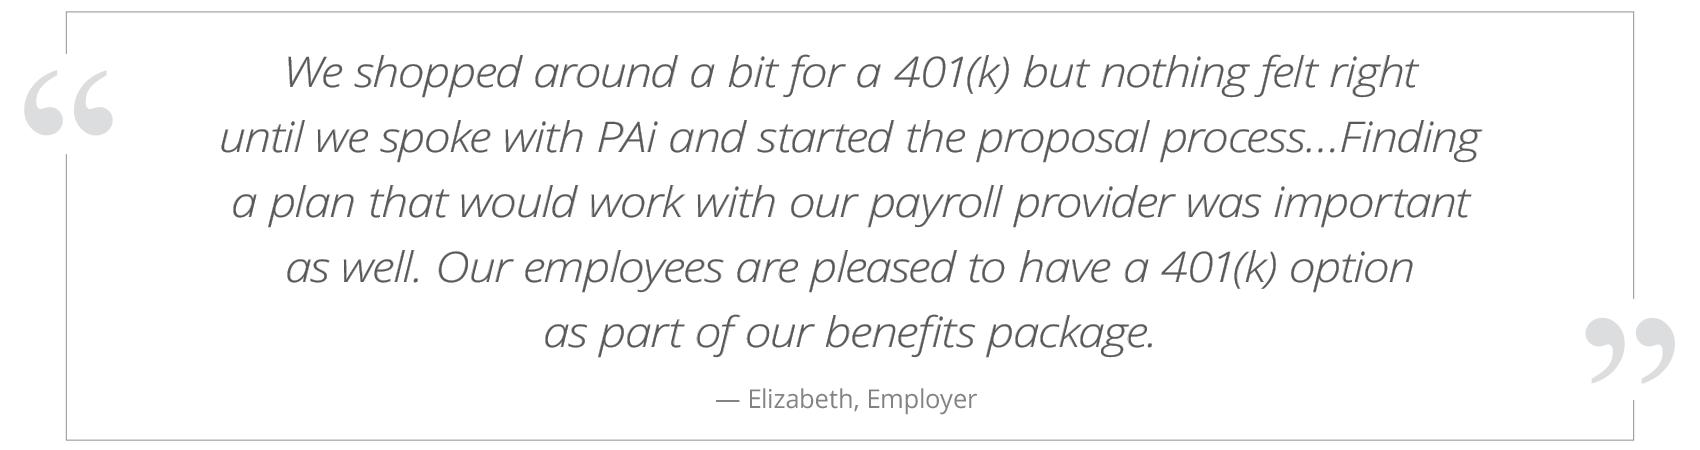 pai-website-testimonial-Elizabeth-Employer.png